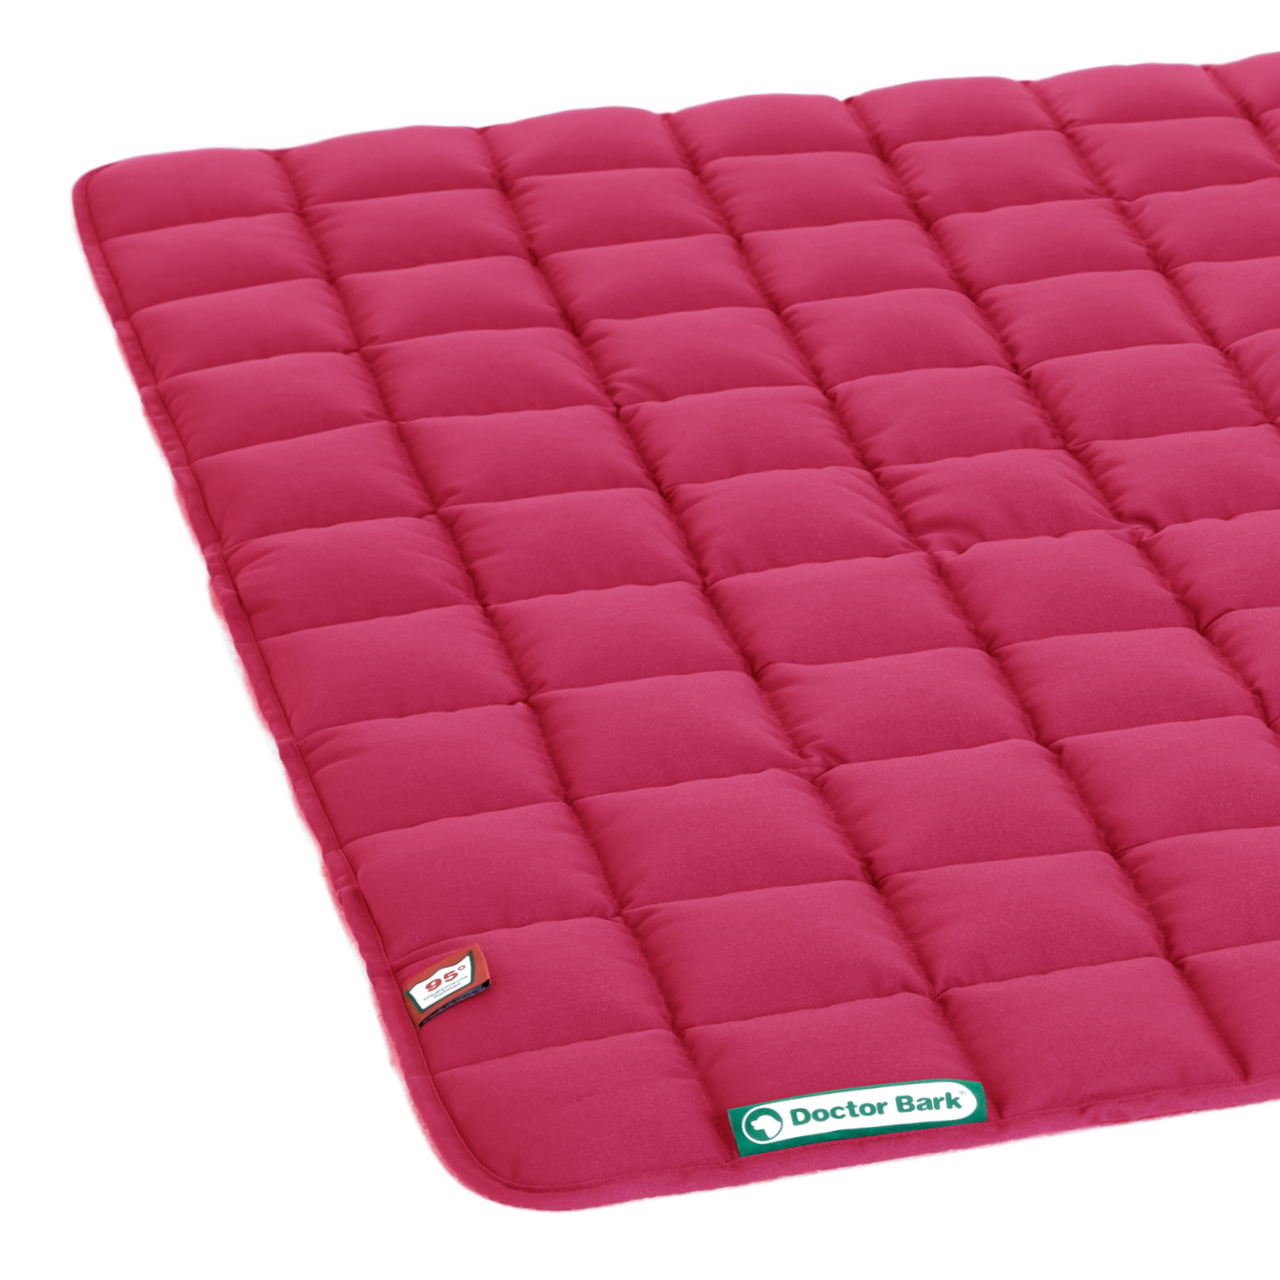 Steppdecke hot pink XXL